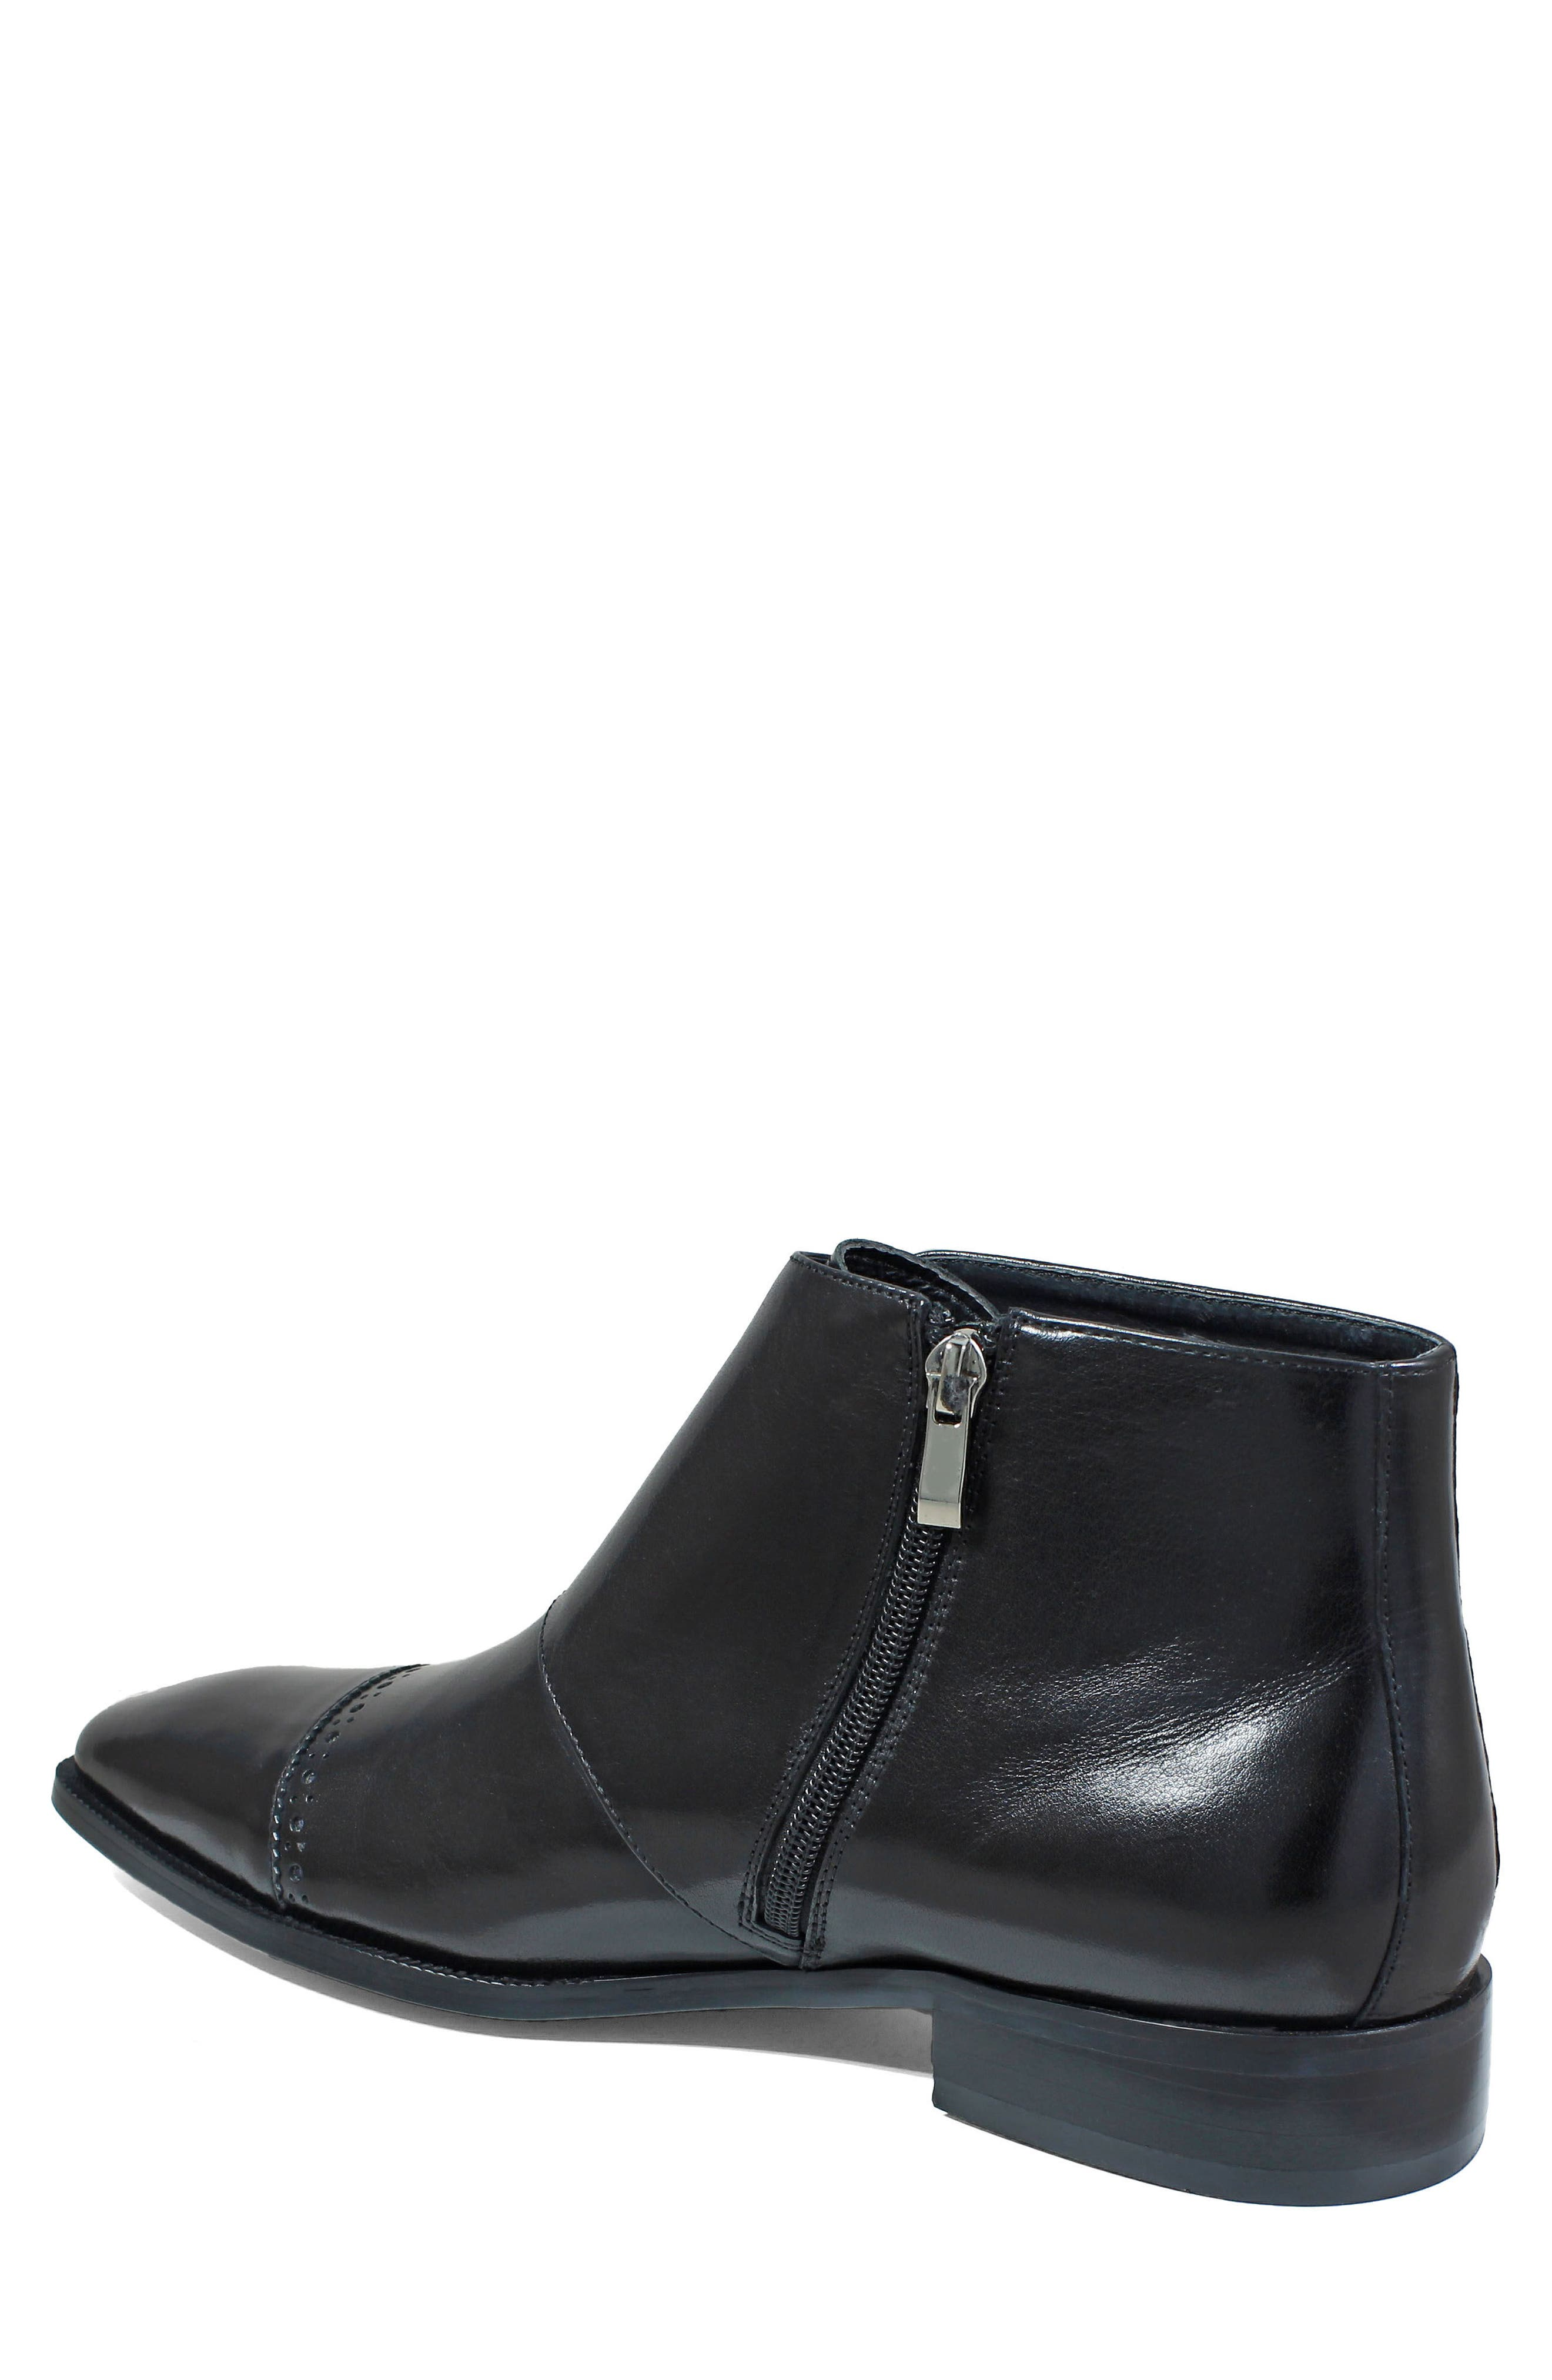 Kason Double Monk Strap Boot,                             Alternate thumbnail 2, color,                             Black Leather